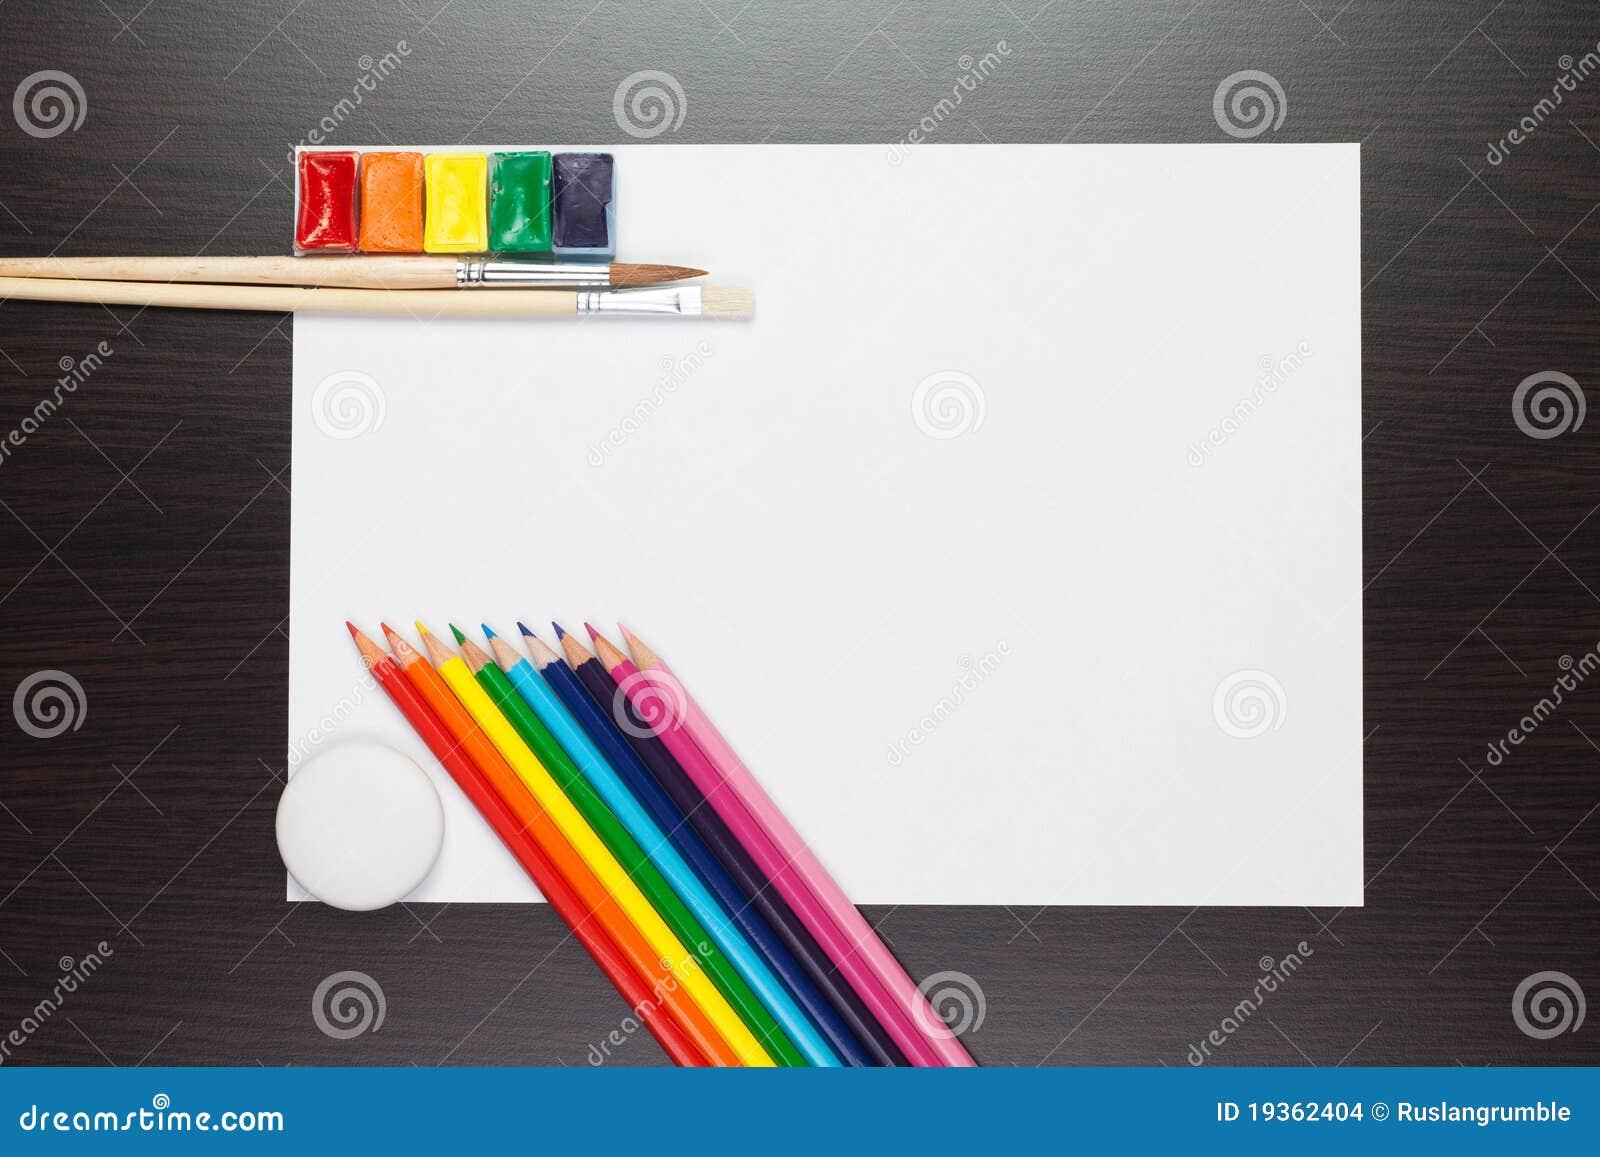 Folha de papel na tabela marrom com pinturas